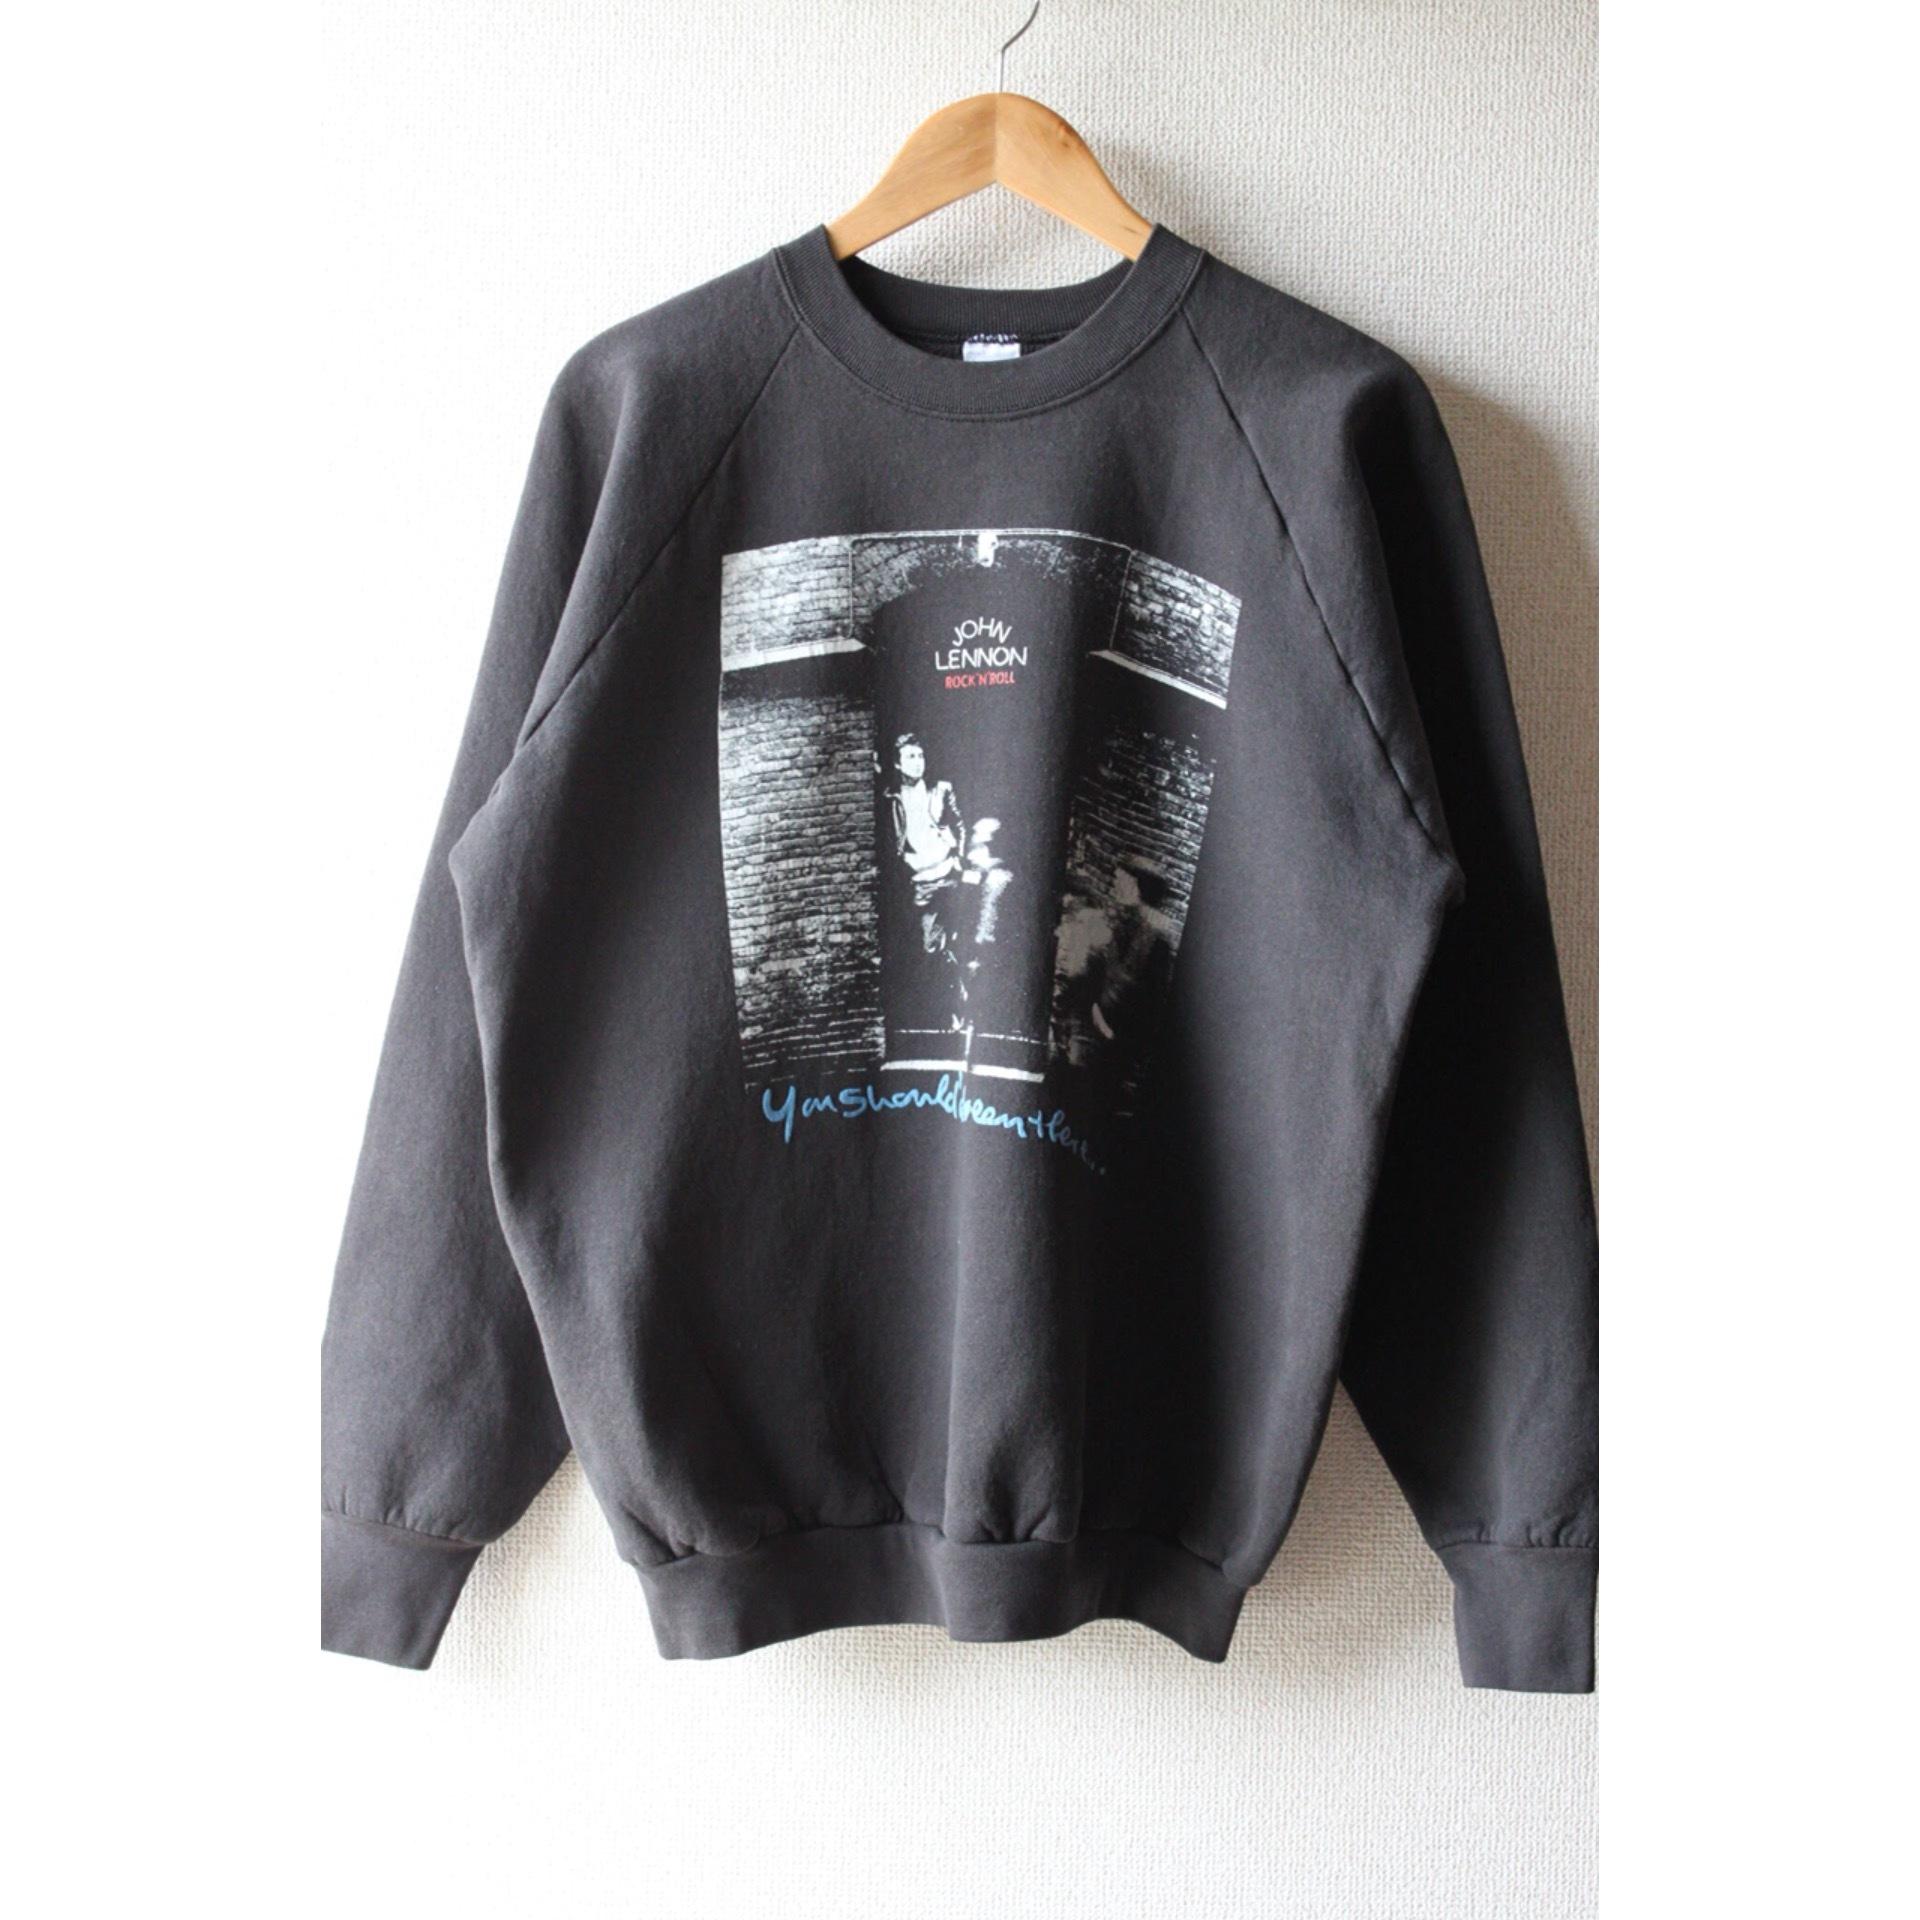 Vintage John Lennon sweater